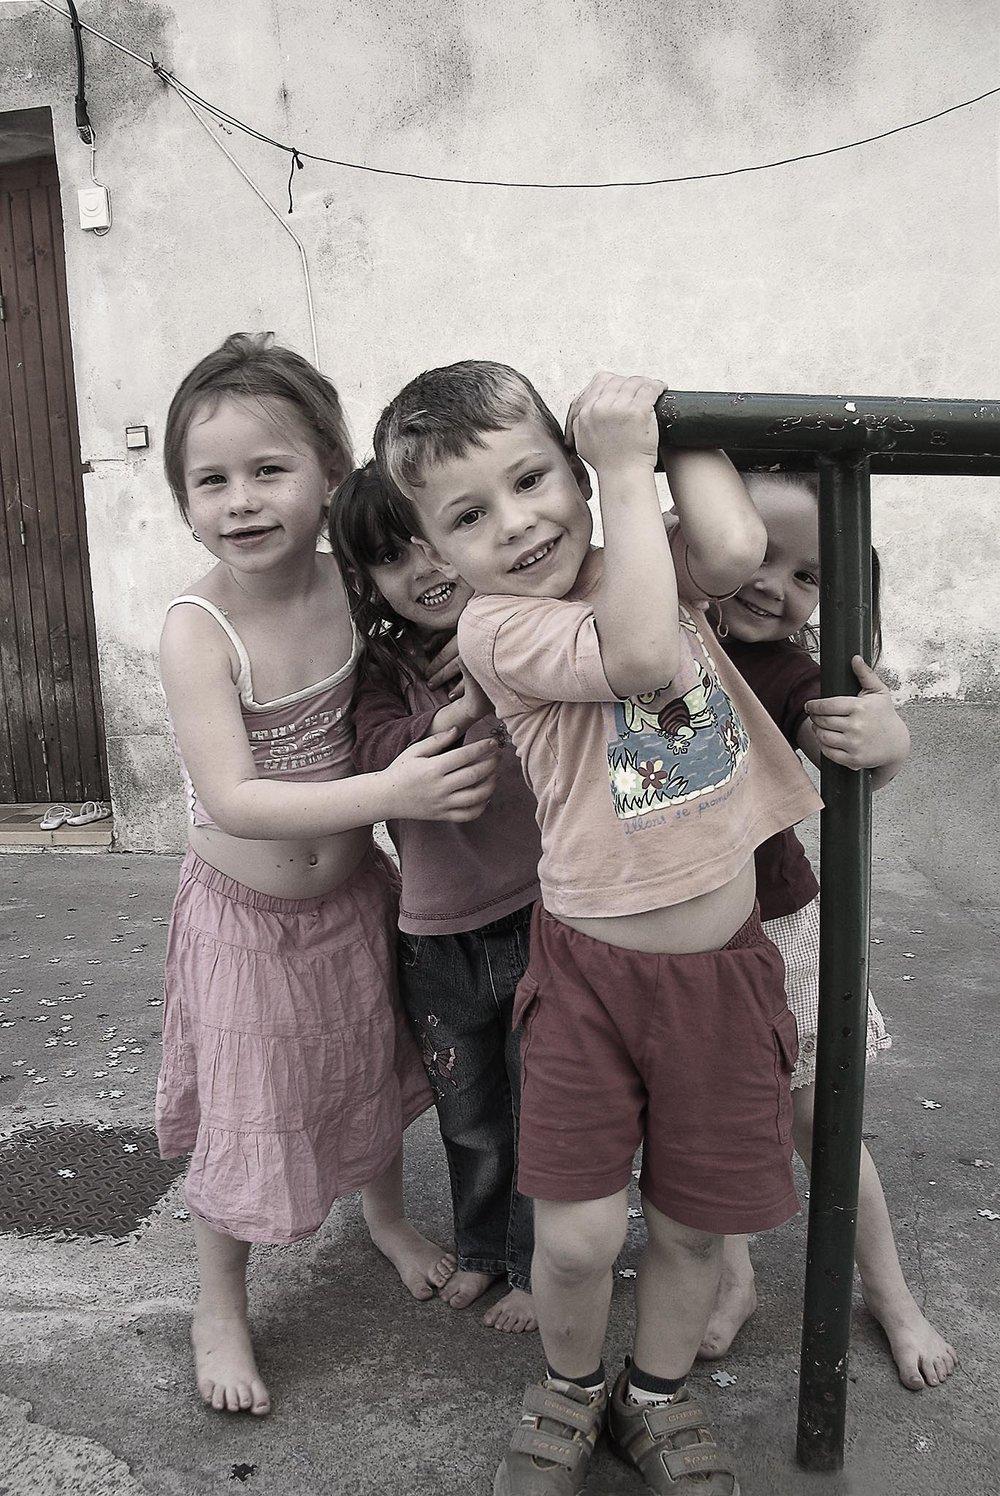 Children playing - Saint-Gilles, France